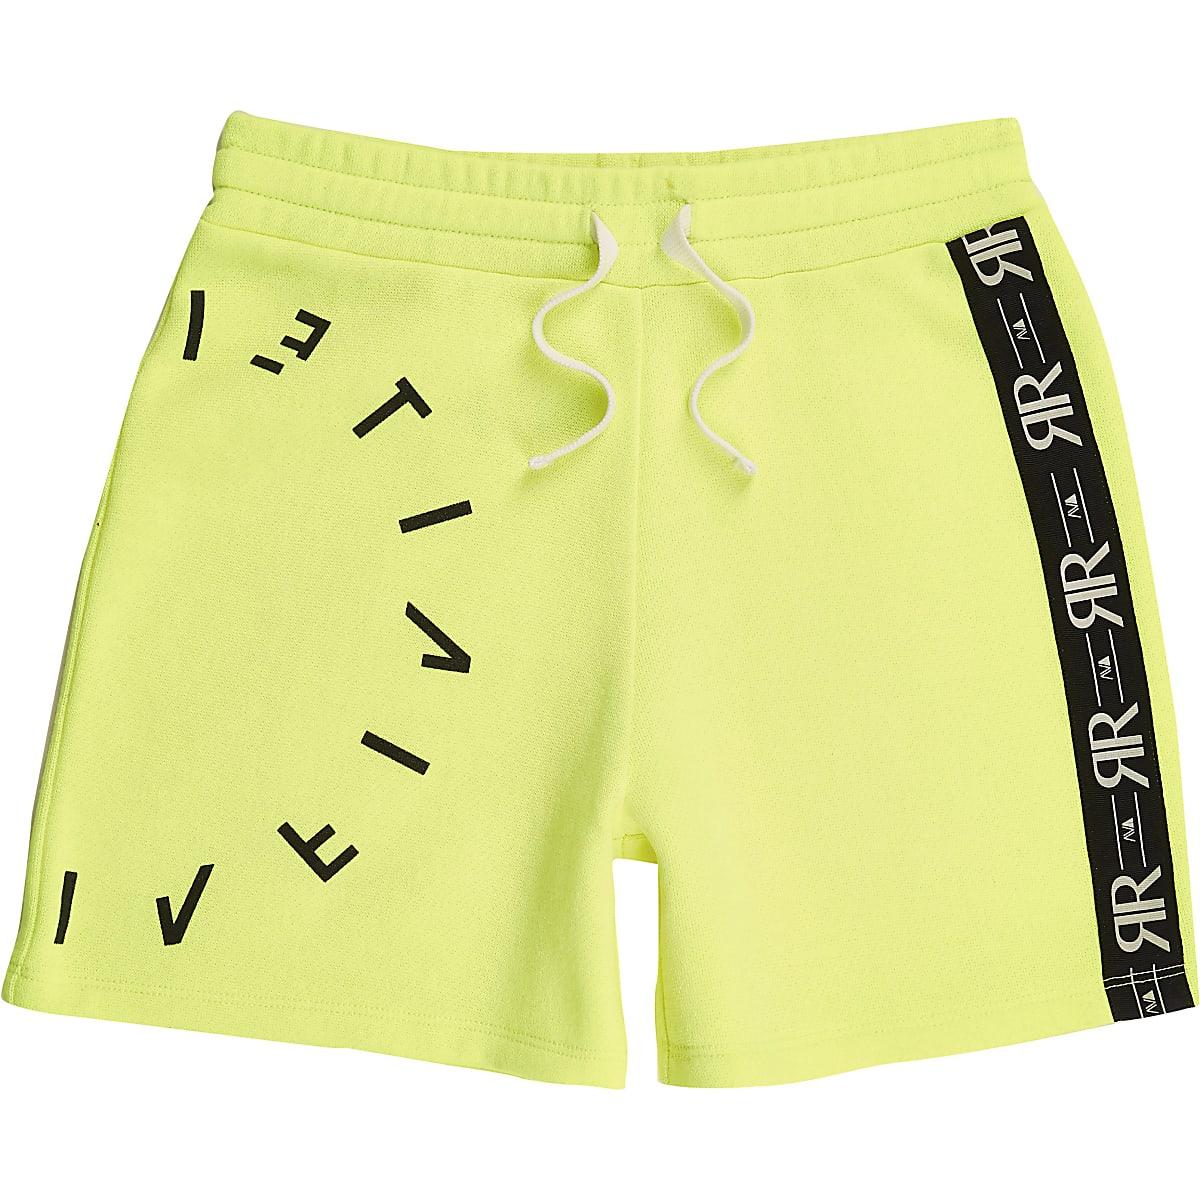 Boys RI Active neon yellow jersey shorts